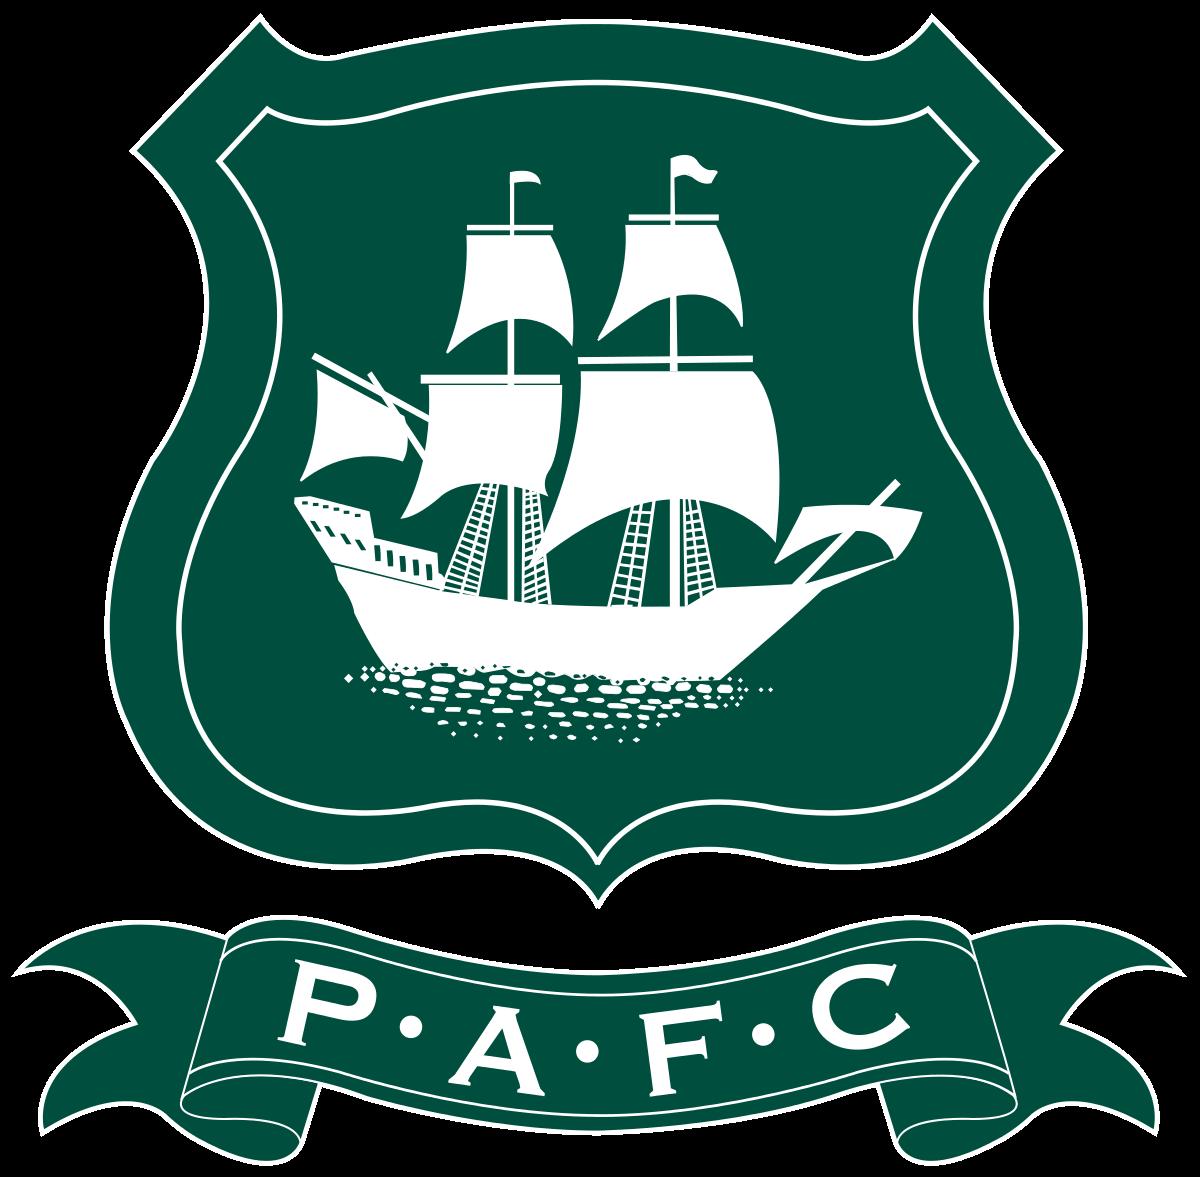 Plymouth Argyle crest